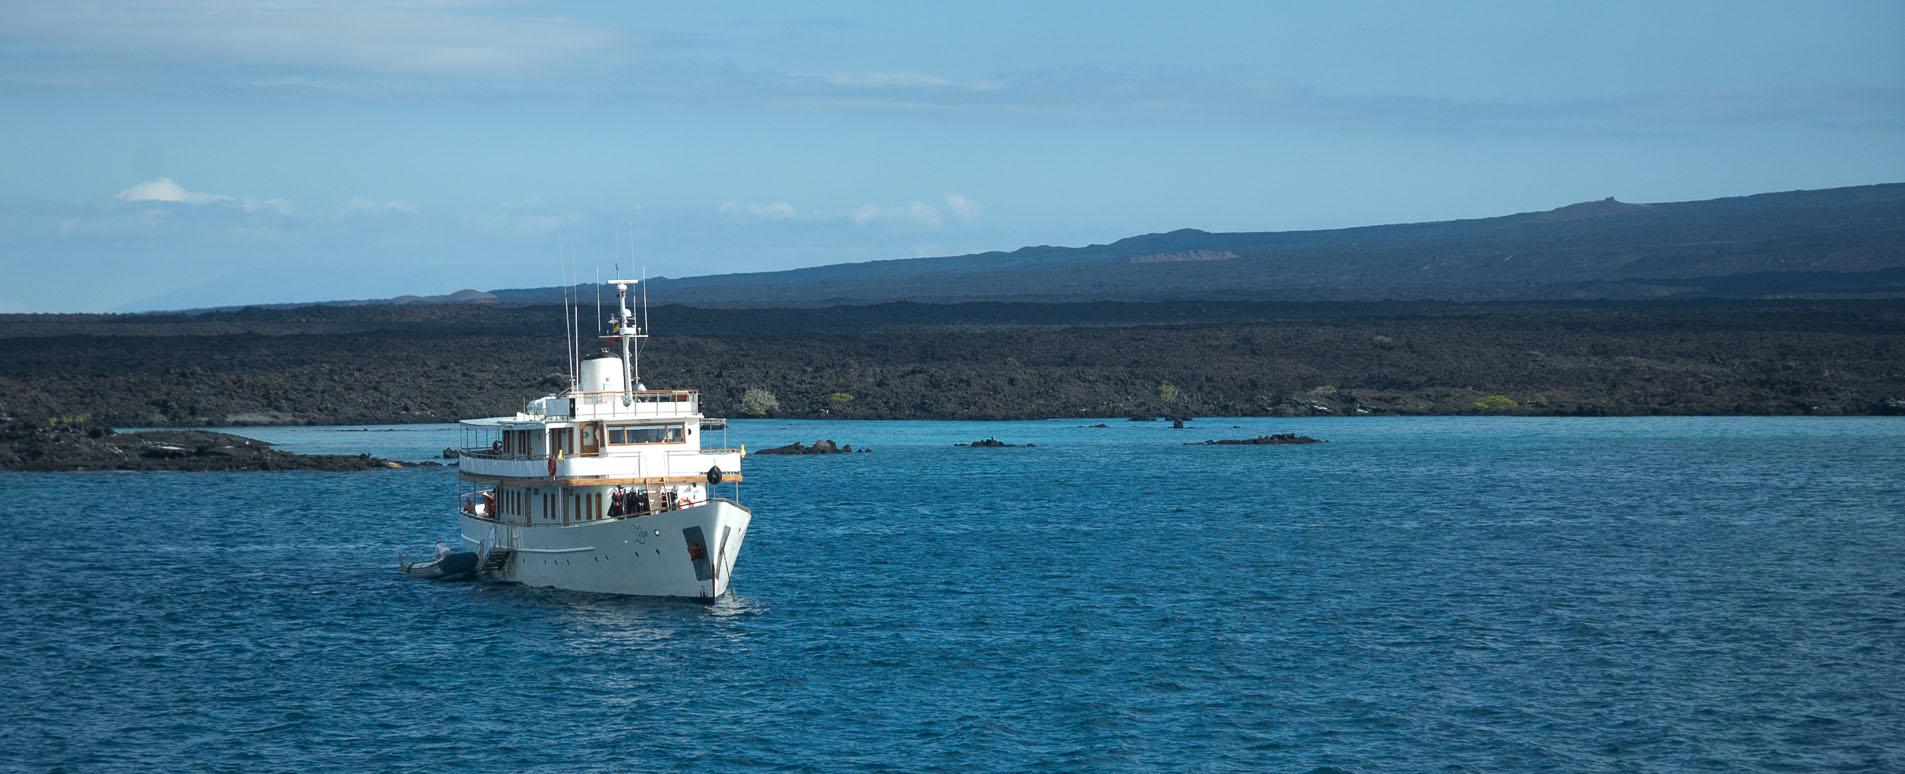 Geodyssey Galapagos Flights To The Galapagos